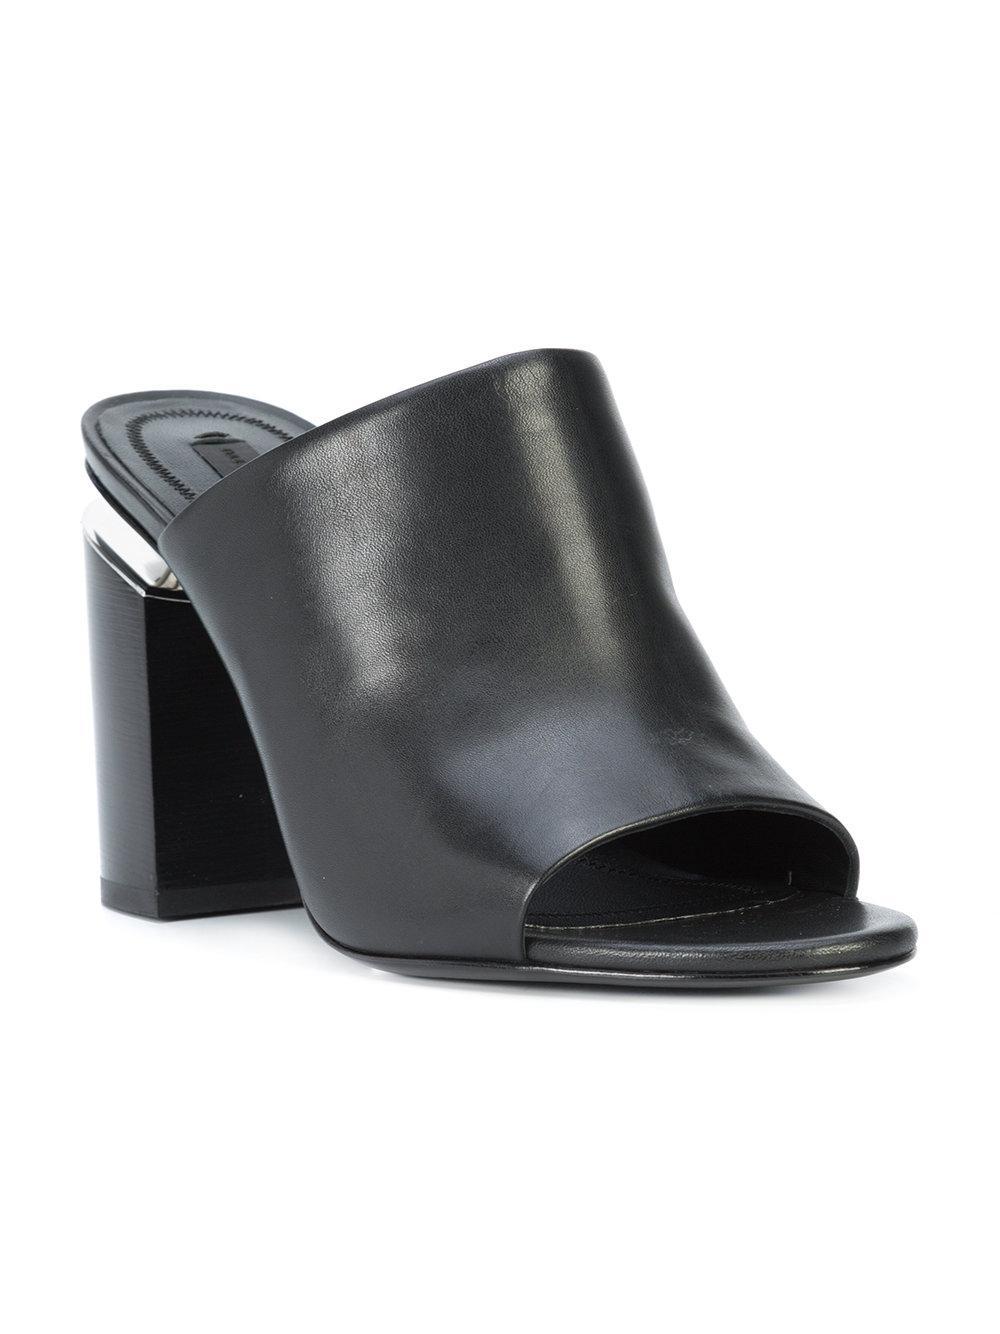 aa3b37a9d6c Lyst - Alexander Wang Avery High Heel Mules in Black